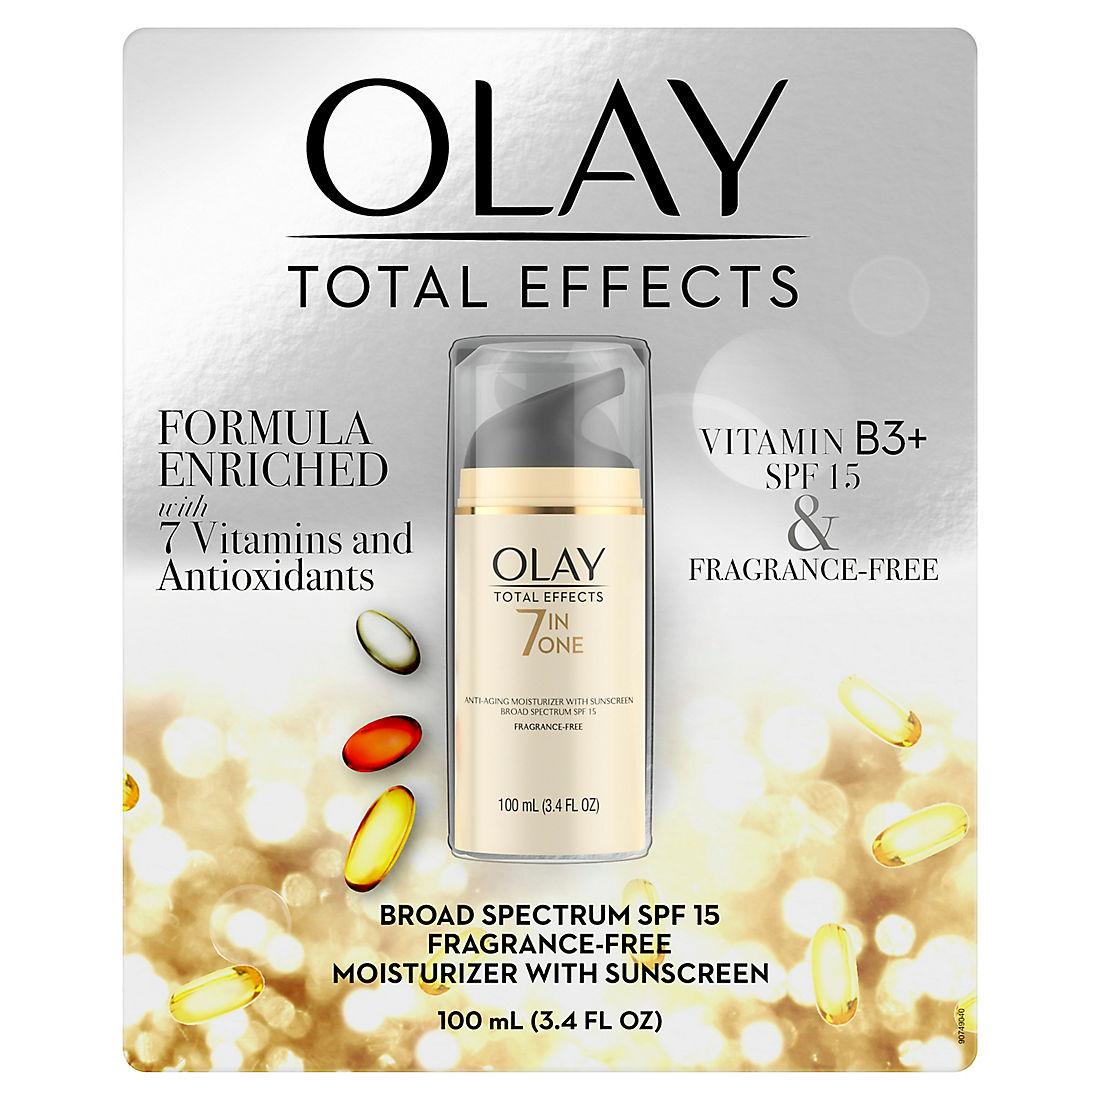 Olay Total Effects 7-in-1 Anti-Aging Moisturizer SPF 15 Fragrance-Free, 3 4  fl oz